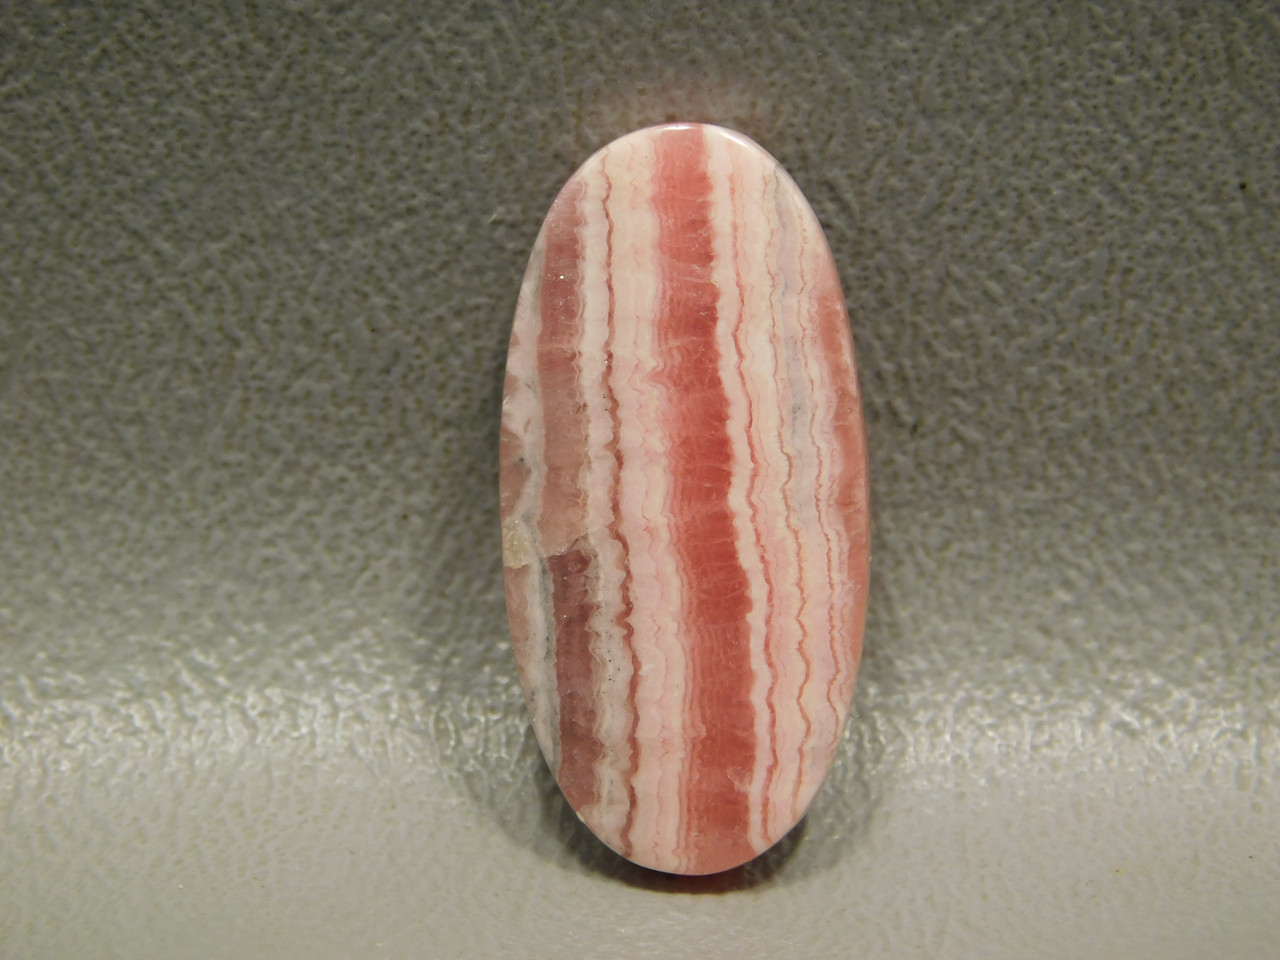 Oval Pink Cabochon Stone Rhodochrosite Jewelry Making Supplies #11